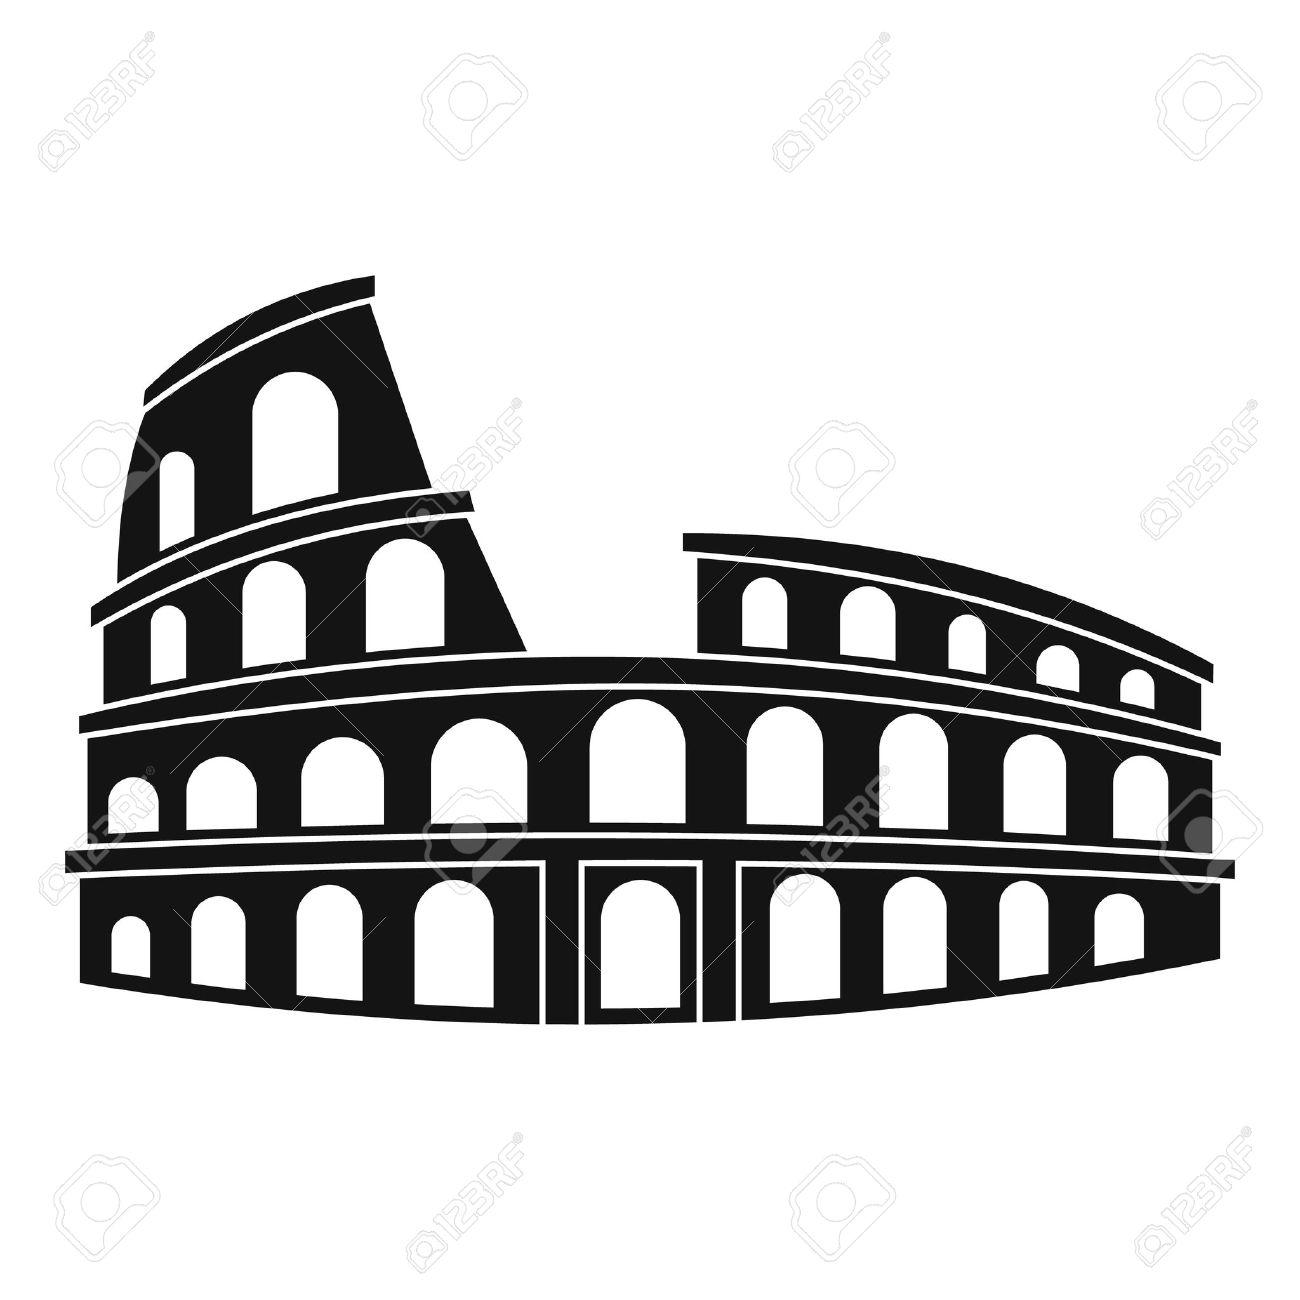 roman colosseum icon simple illustration of colosseum vector rh 123rf com